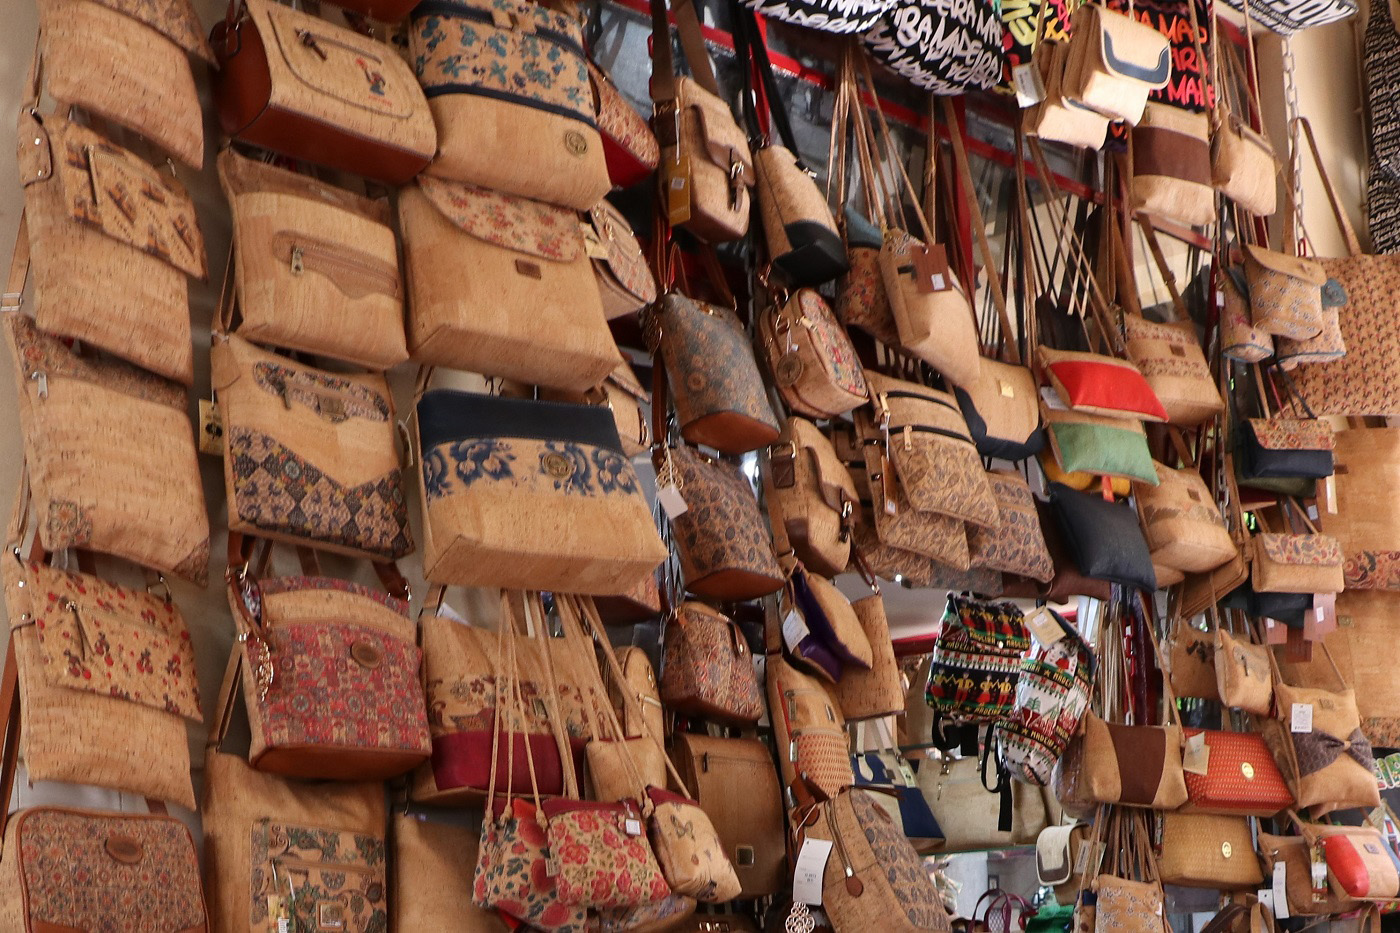 Bags of Bags!